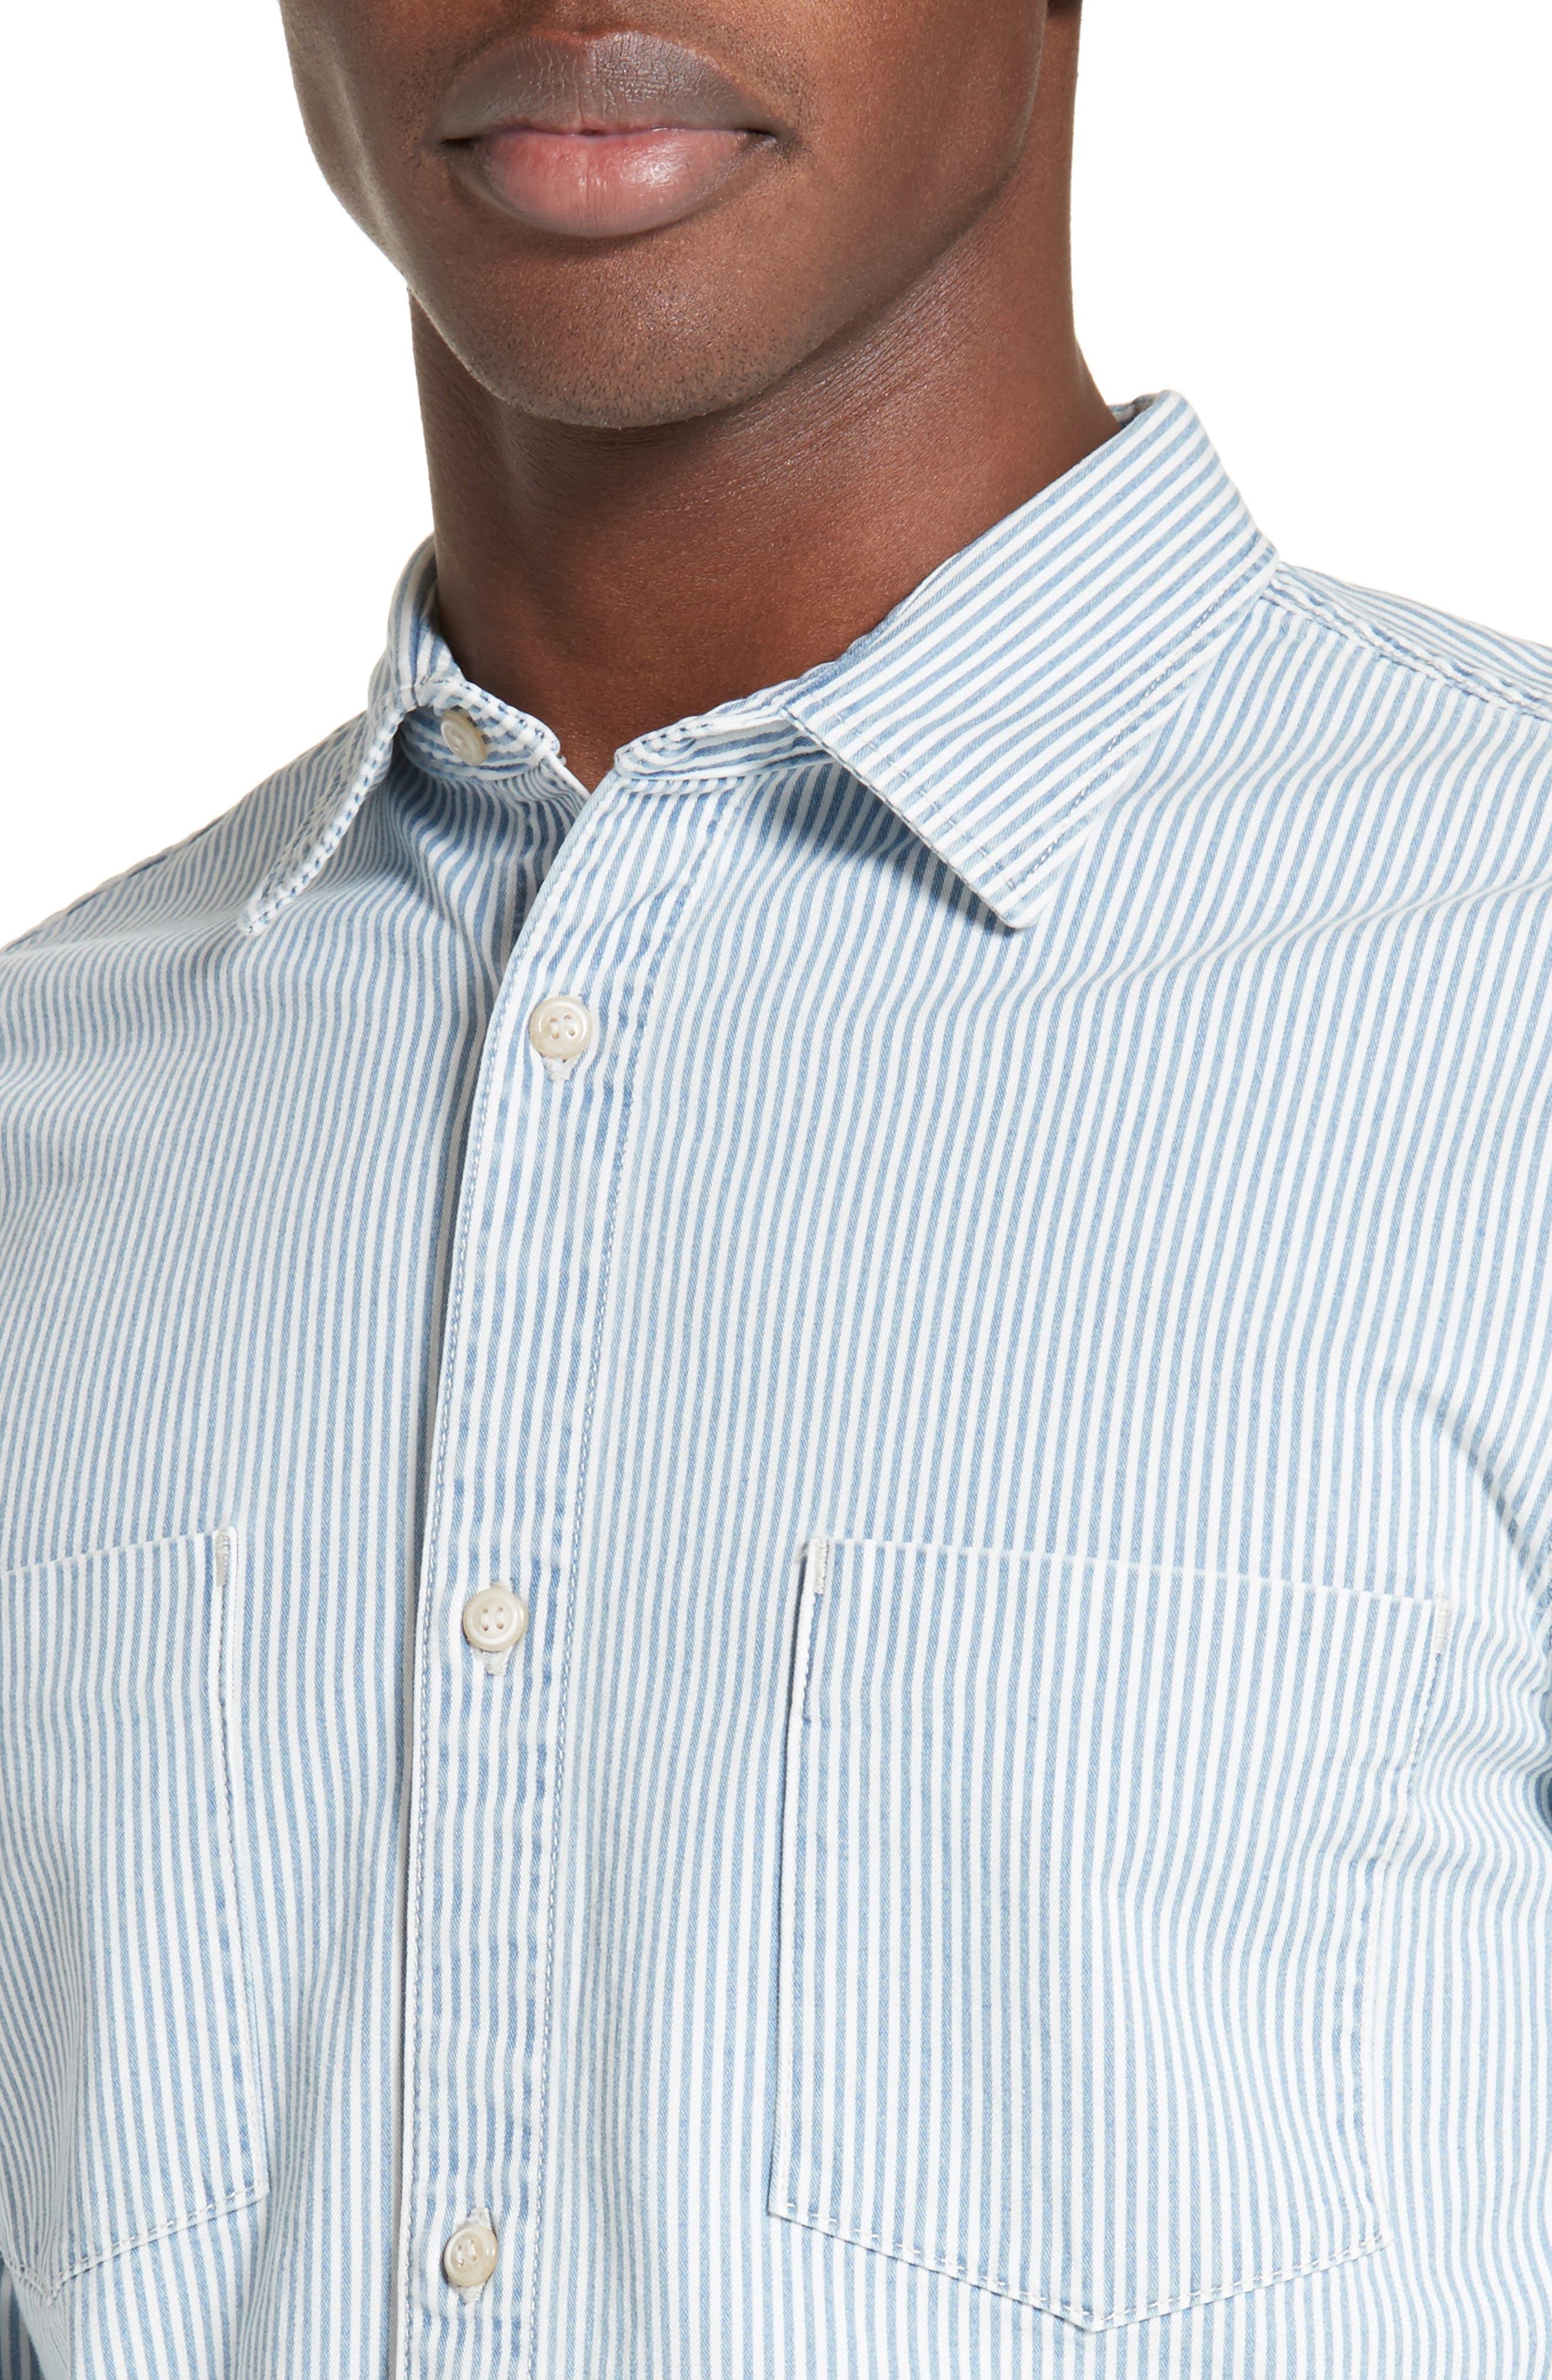 Riga Microstripe Denim Sport Shirt,                         Main,                         color, 461